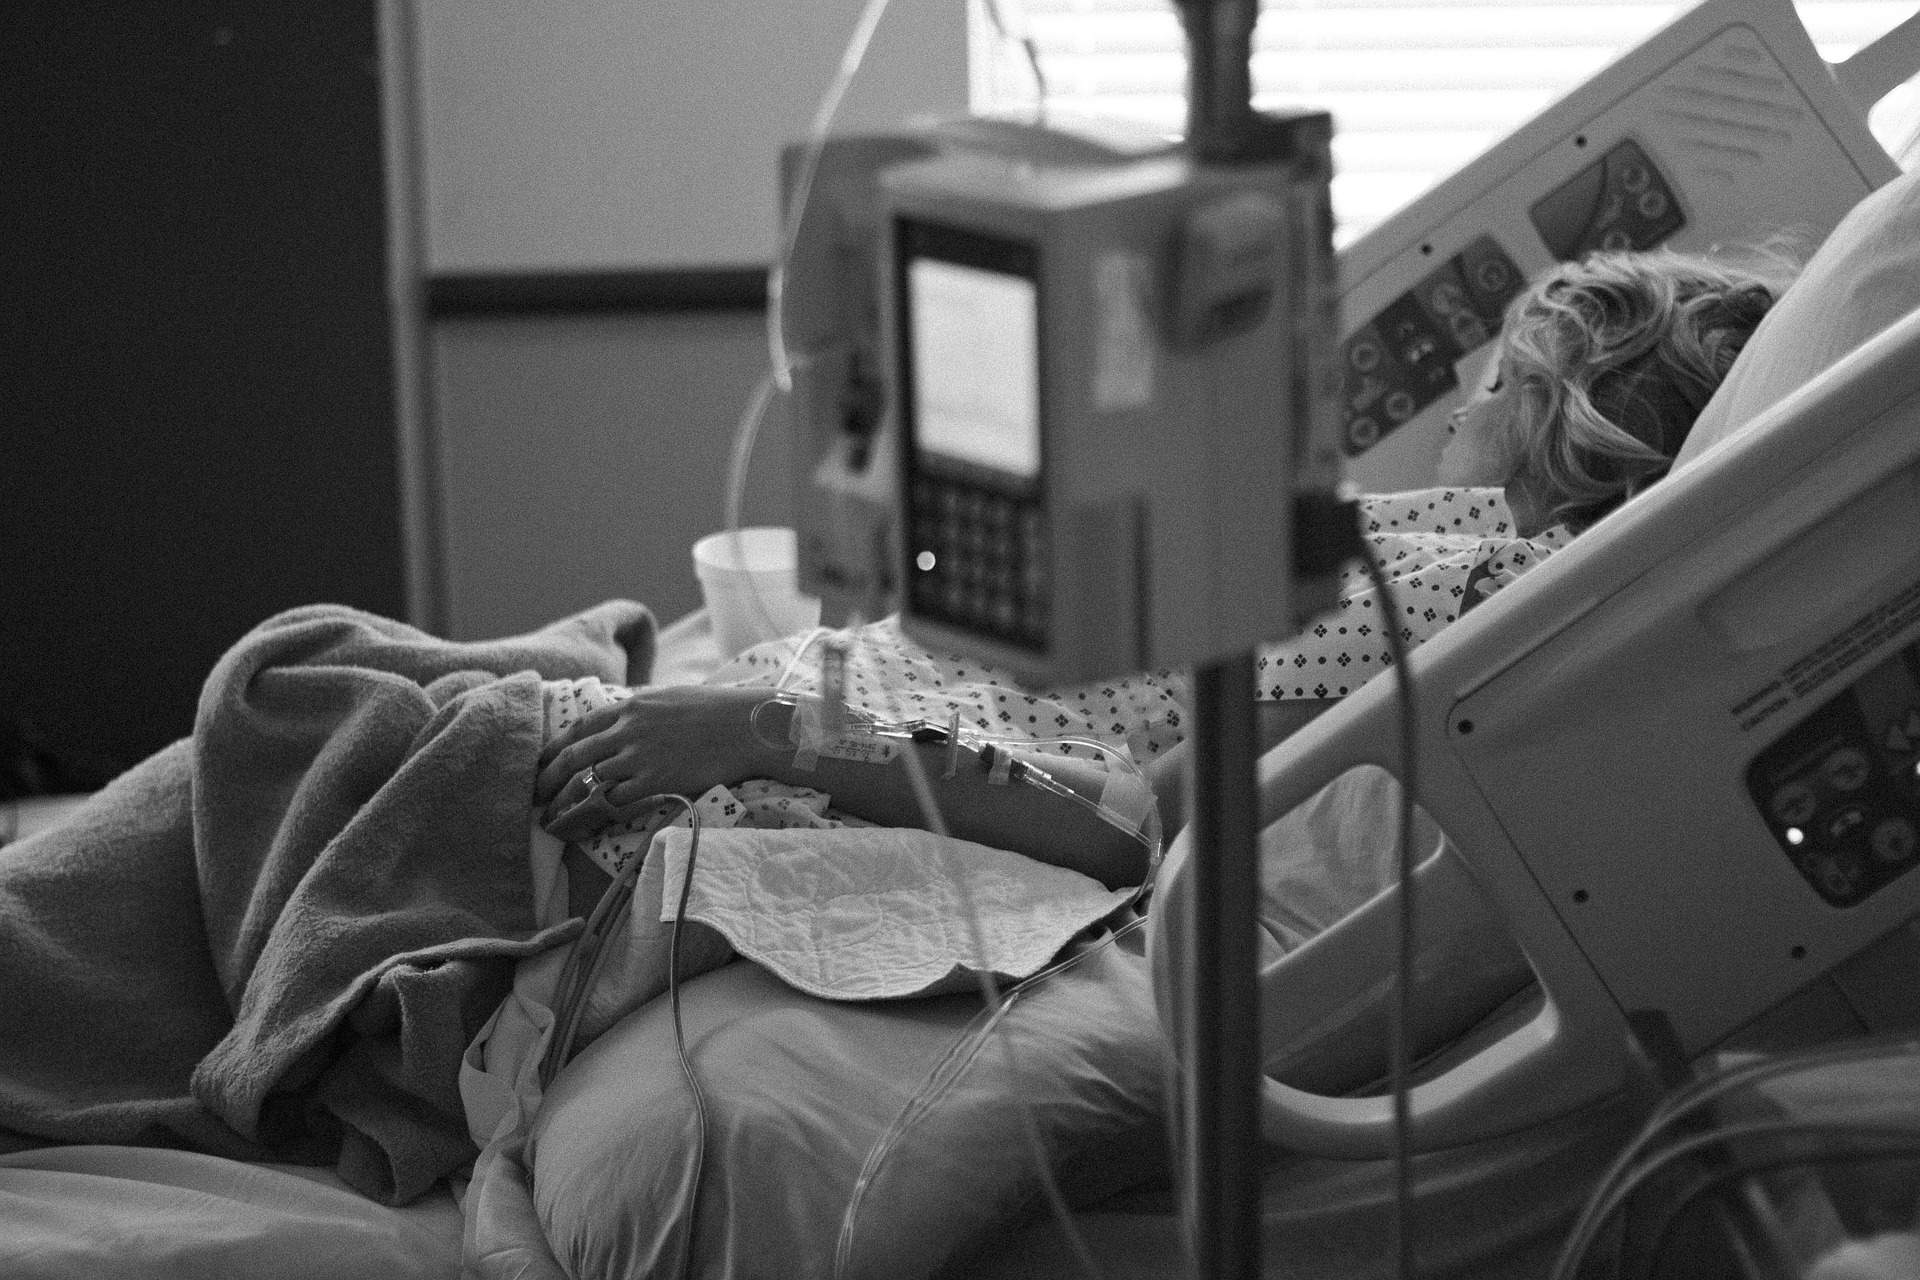 Hospital Sick Patient